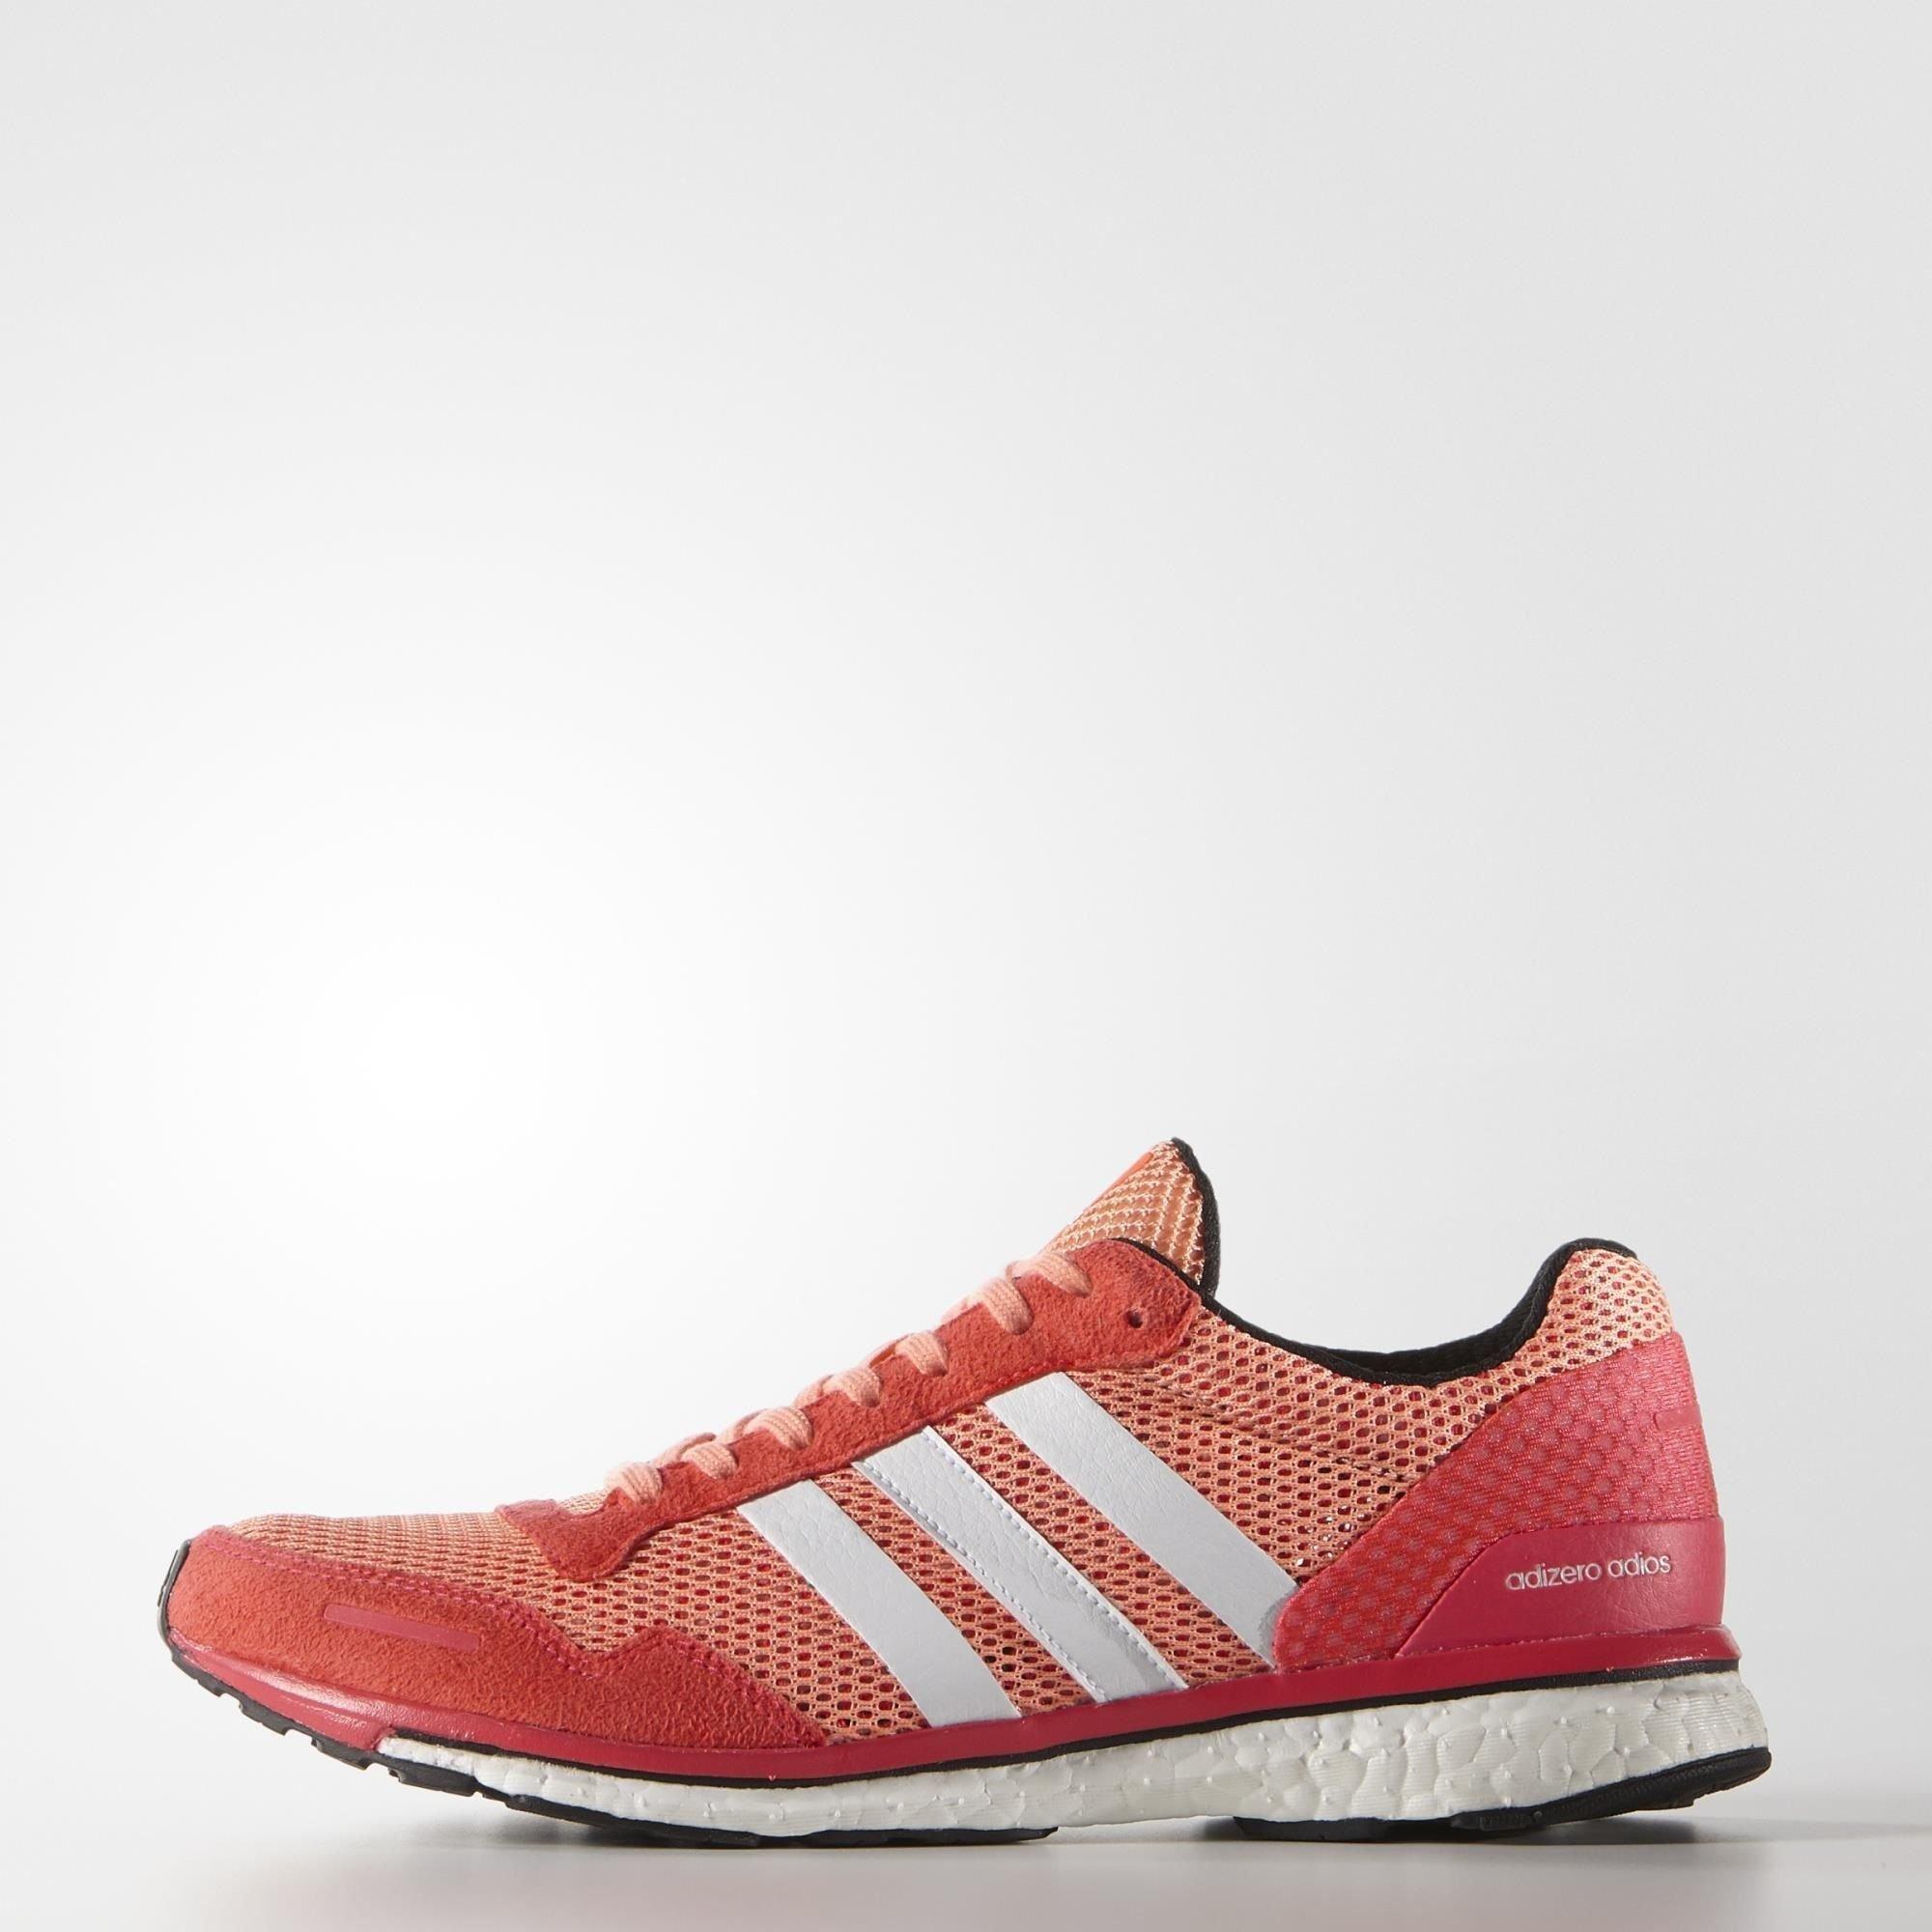 Best pris på Adidas Adizero Adios 3 (Dame) Se priser før